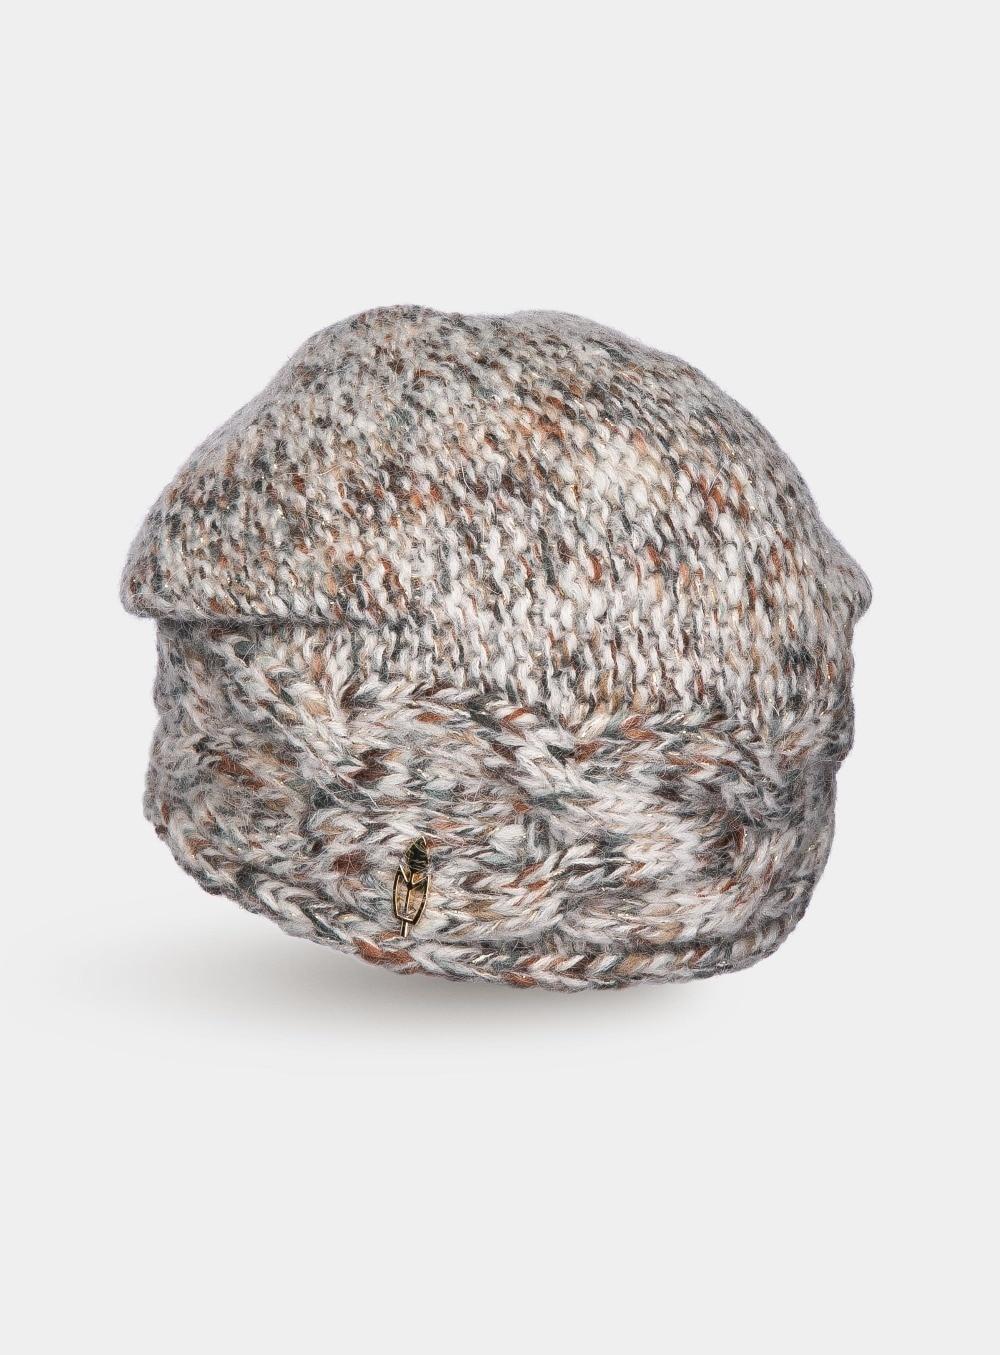 Фото - Hat for women Canoe 3447150 ELEANORA chispaulo women brand leather handbags hot sell luxury handbags women bags designer bolsa femininas women s new t574